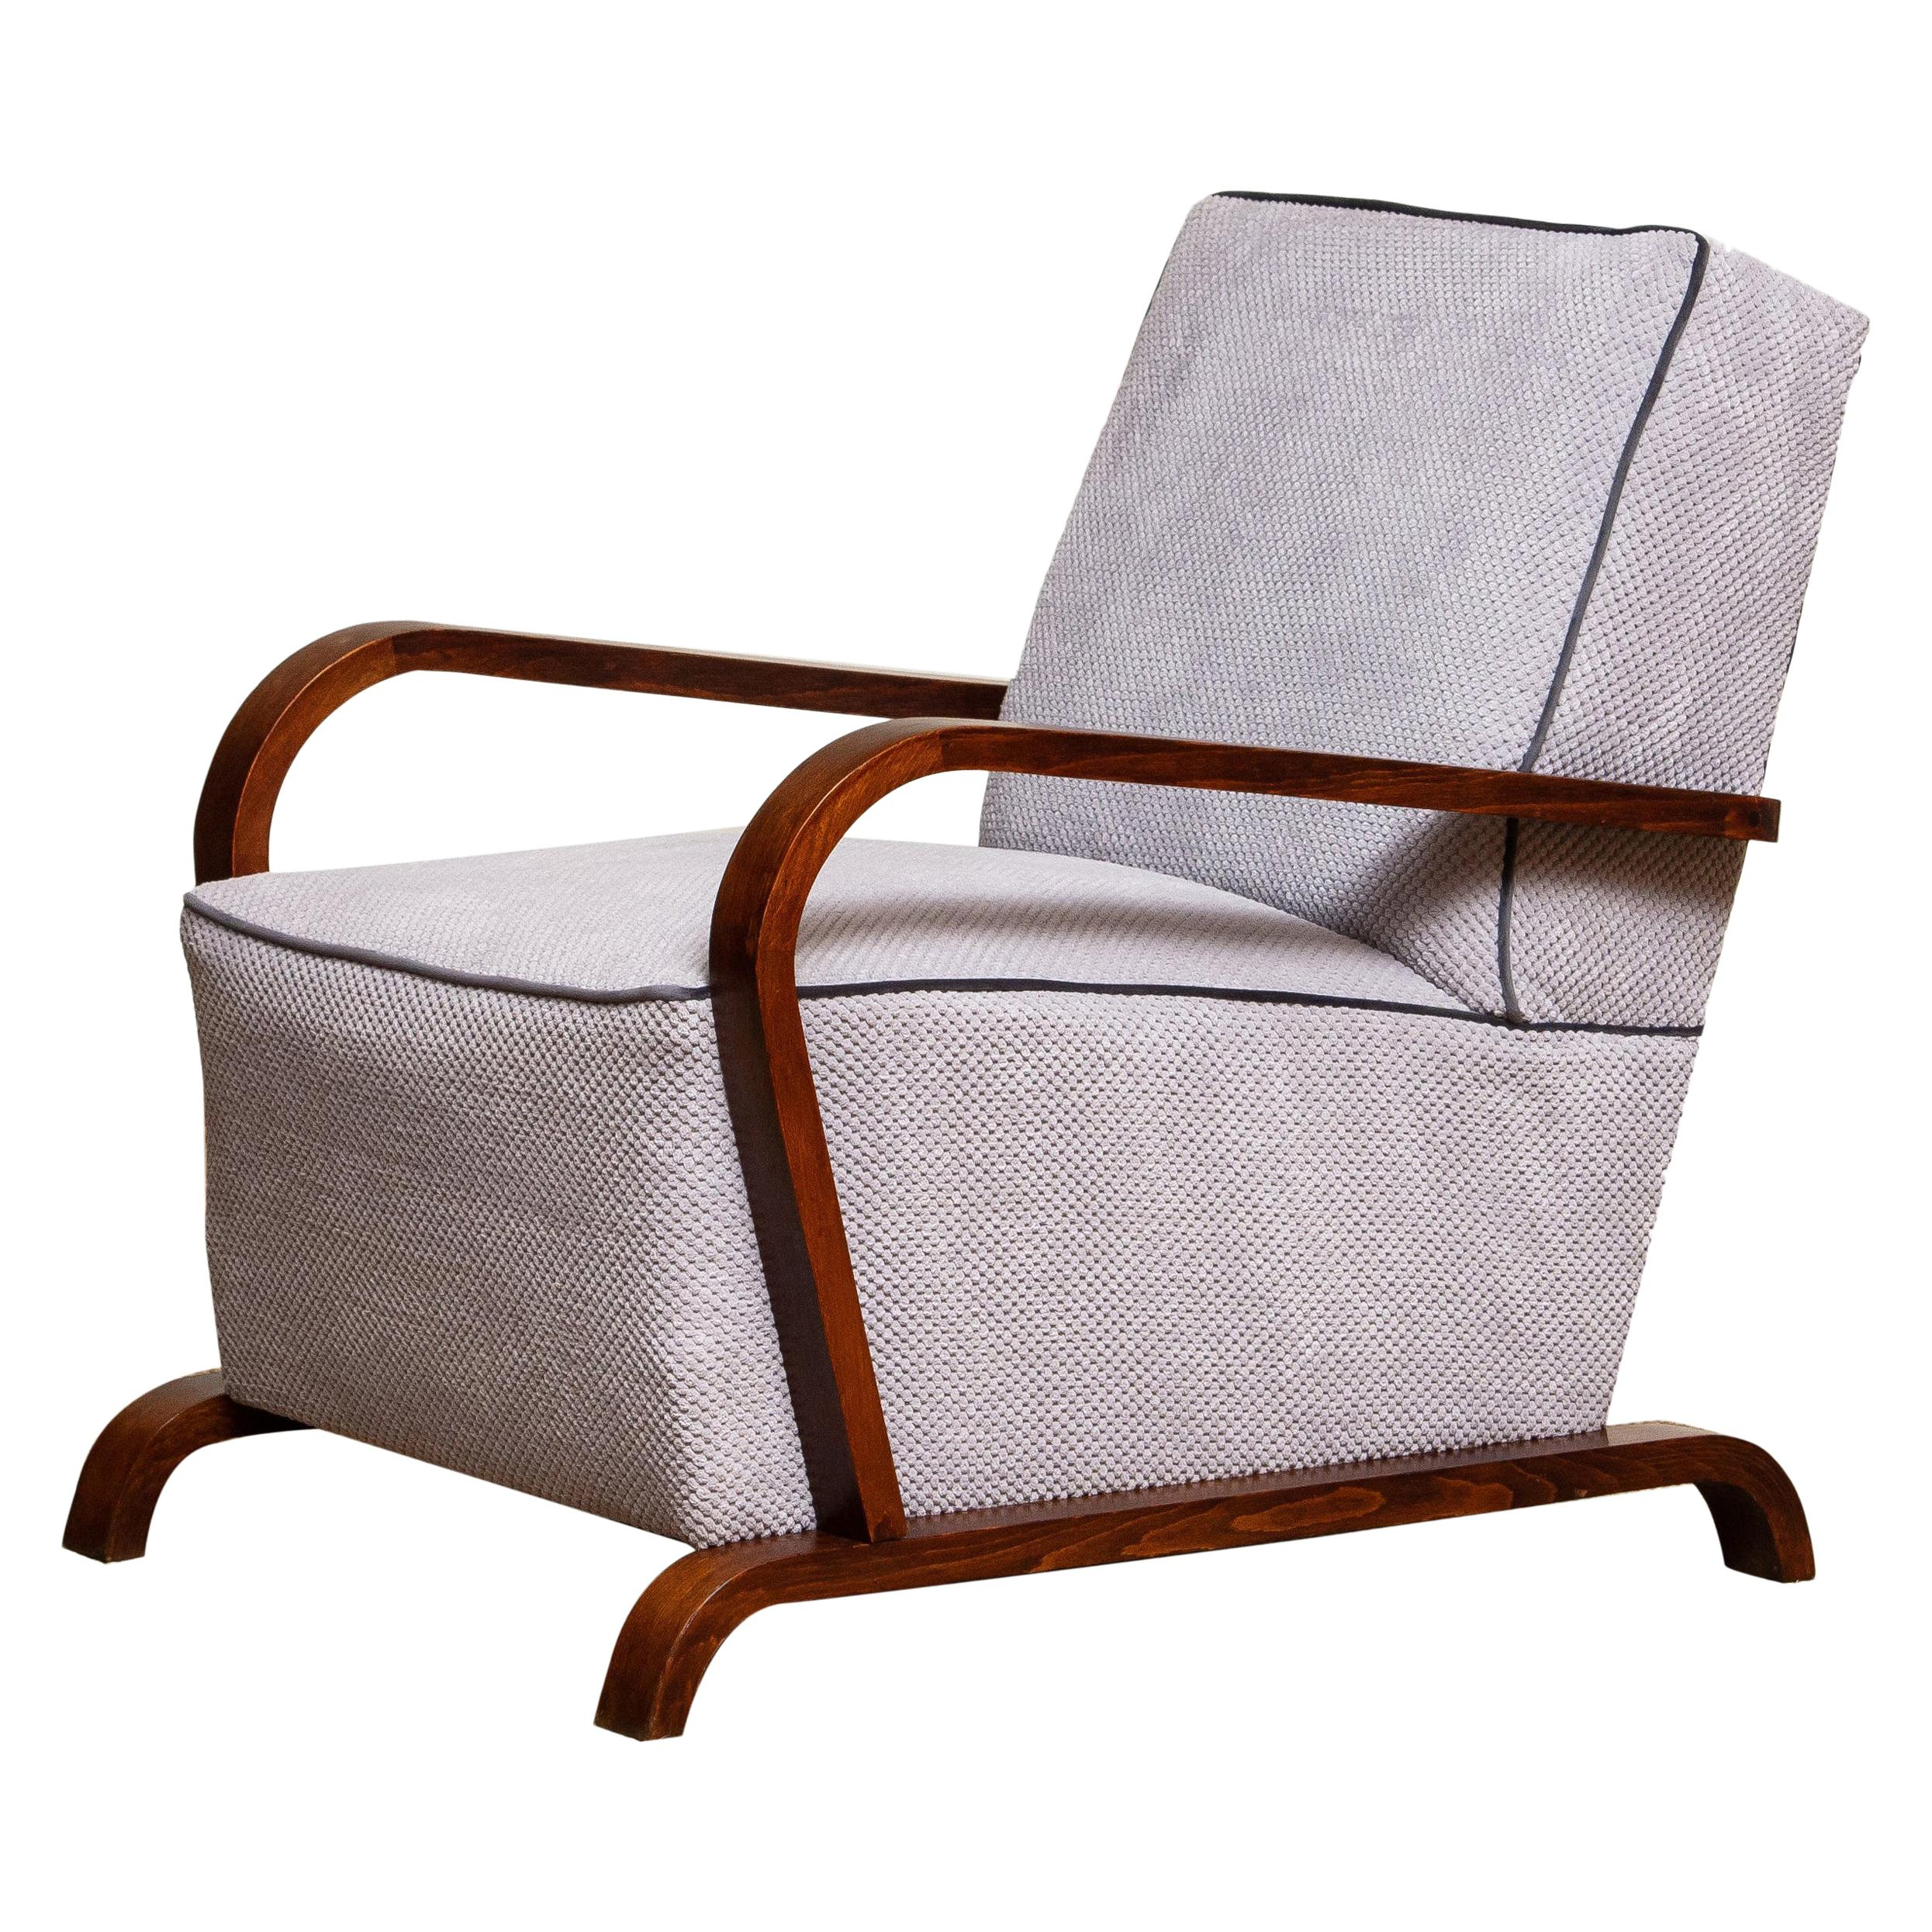 1920s, Scandinavian Art Deco Armchair / Lounge / Club Chairs from Sweden 1